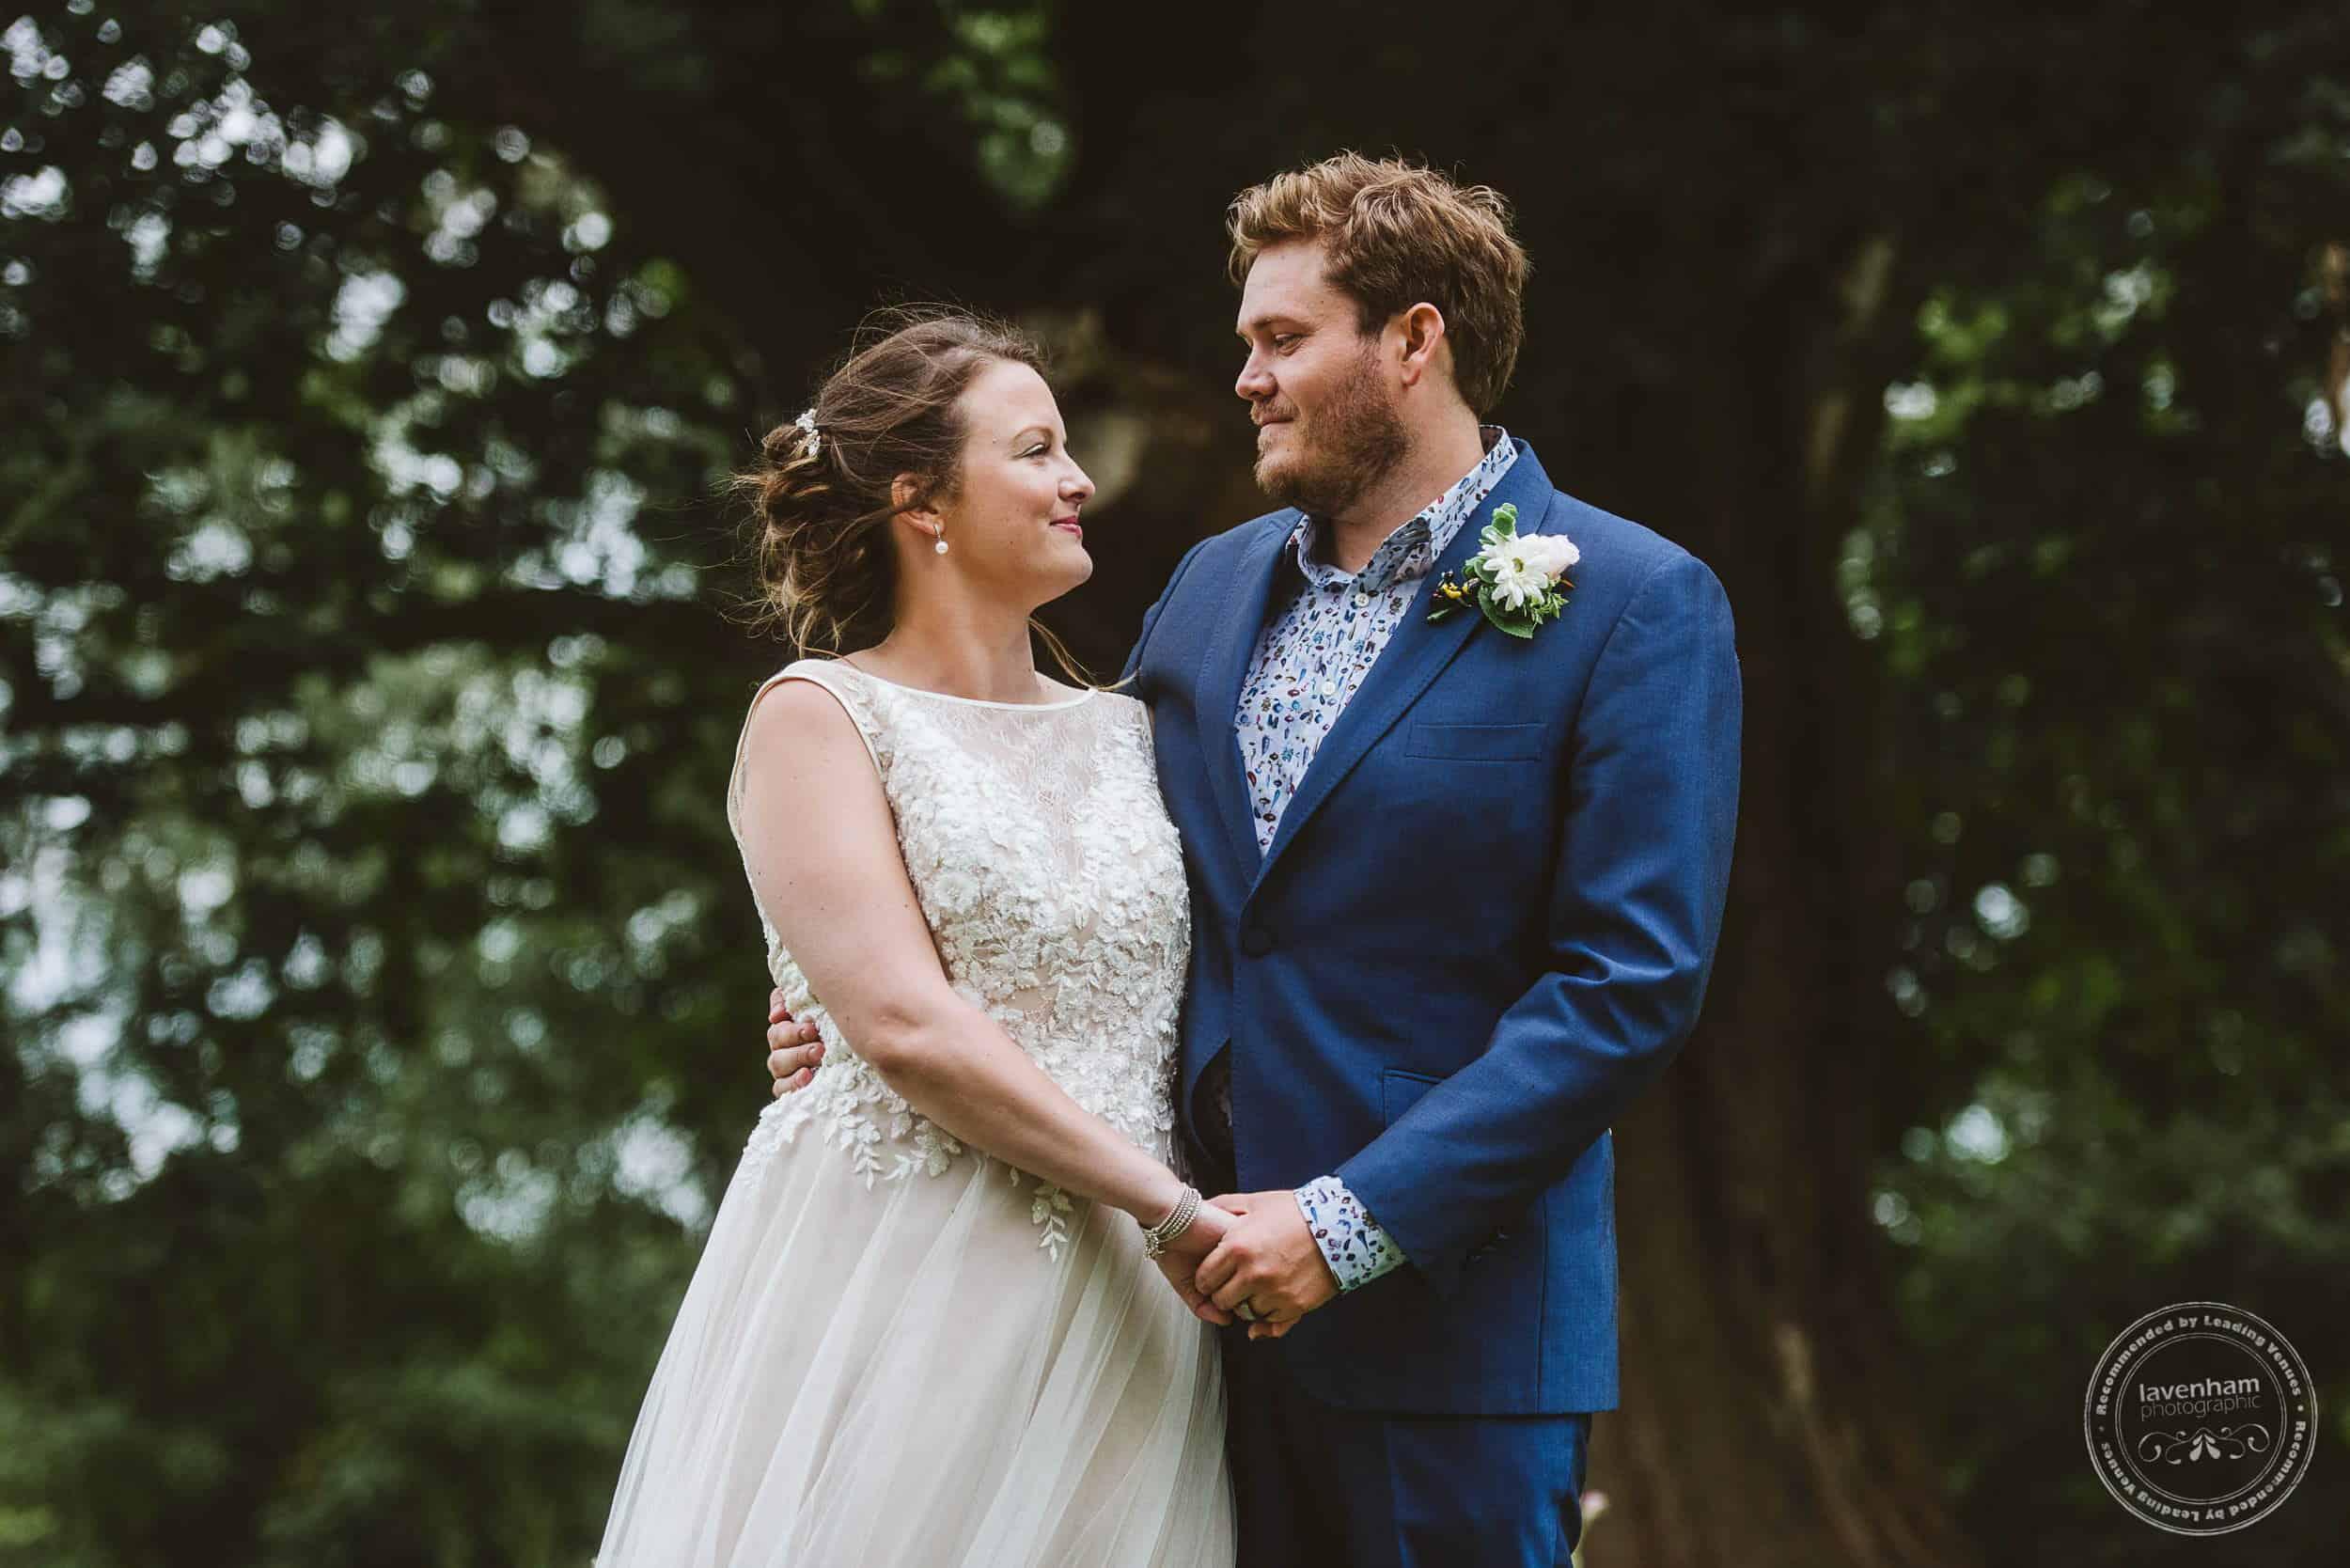 180818 Marks Hall Wedding Photography Lavenham Photographic 103